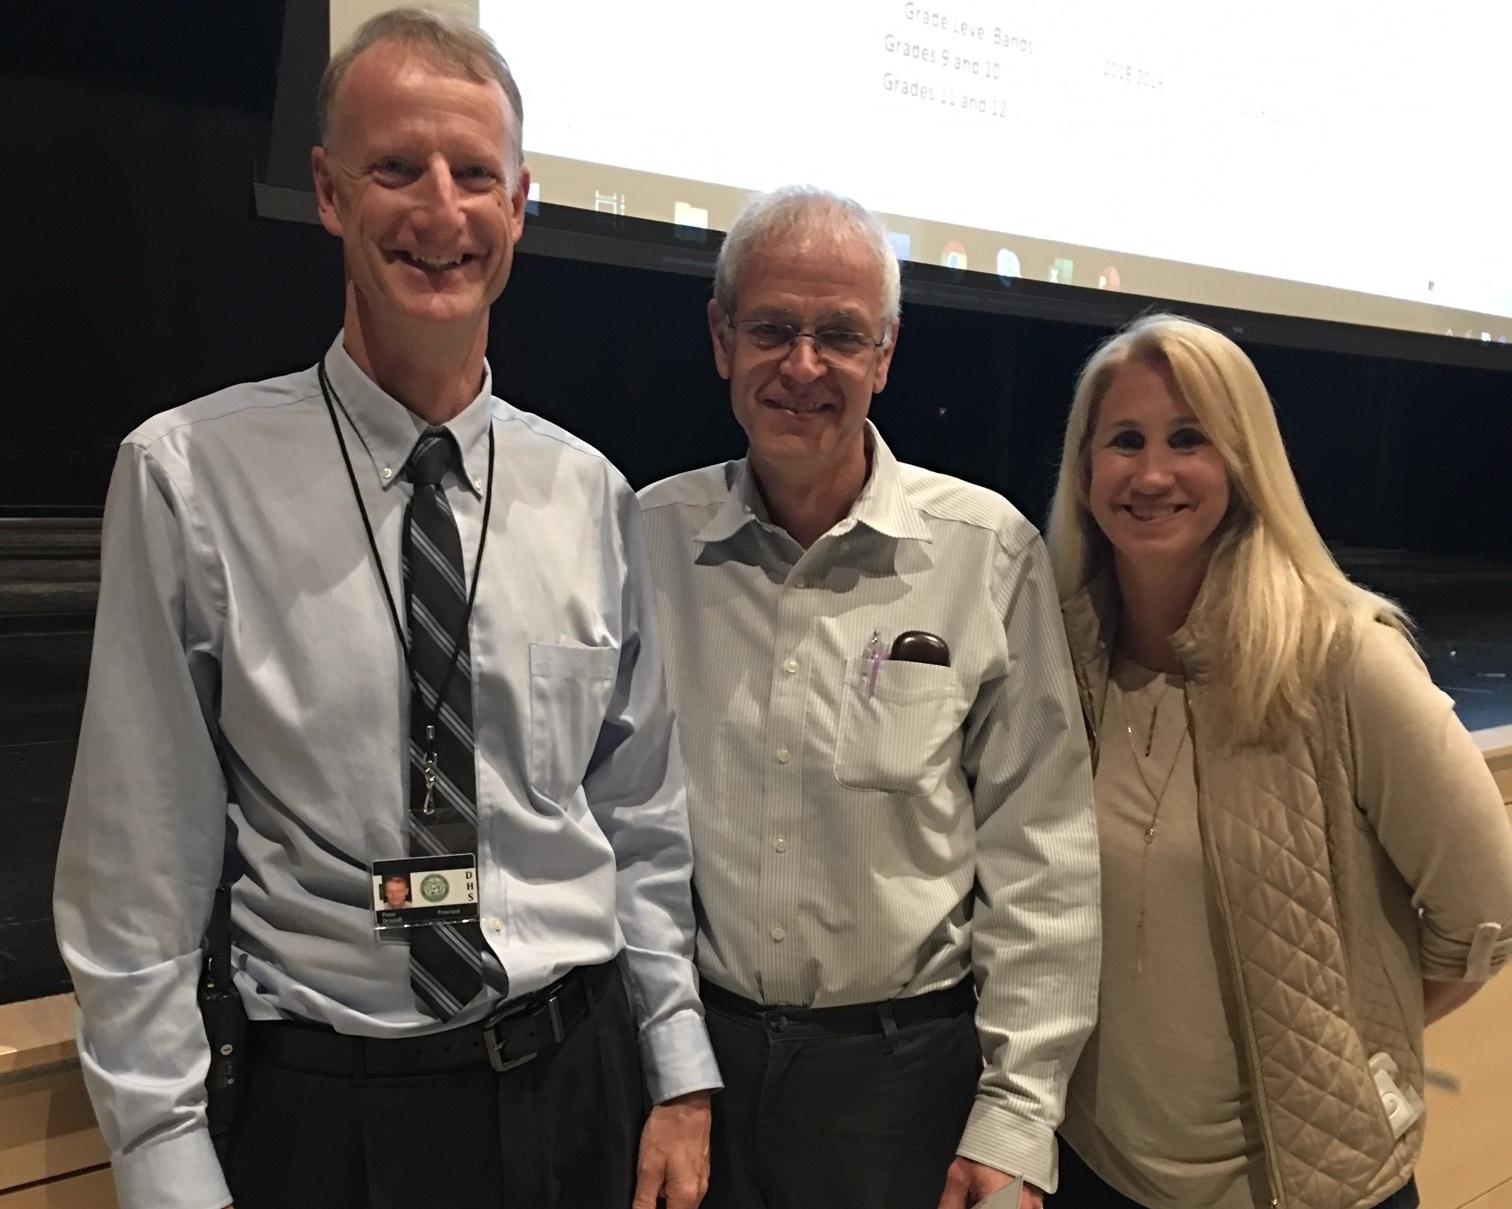 SEED grants Dover High School statistics teacher Tim Elliott funding to buy digital calibers.